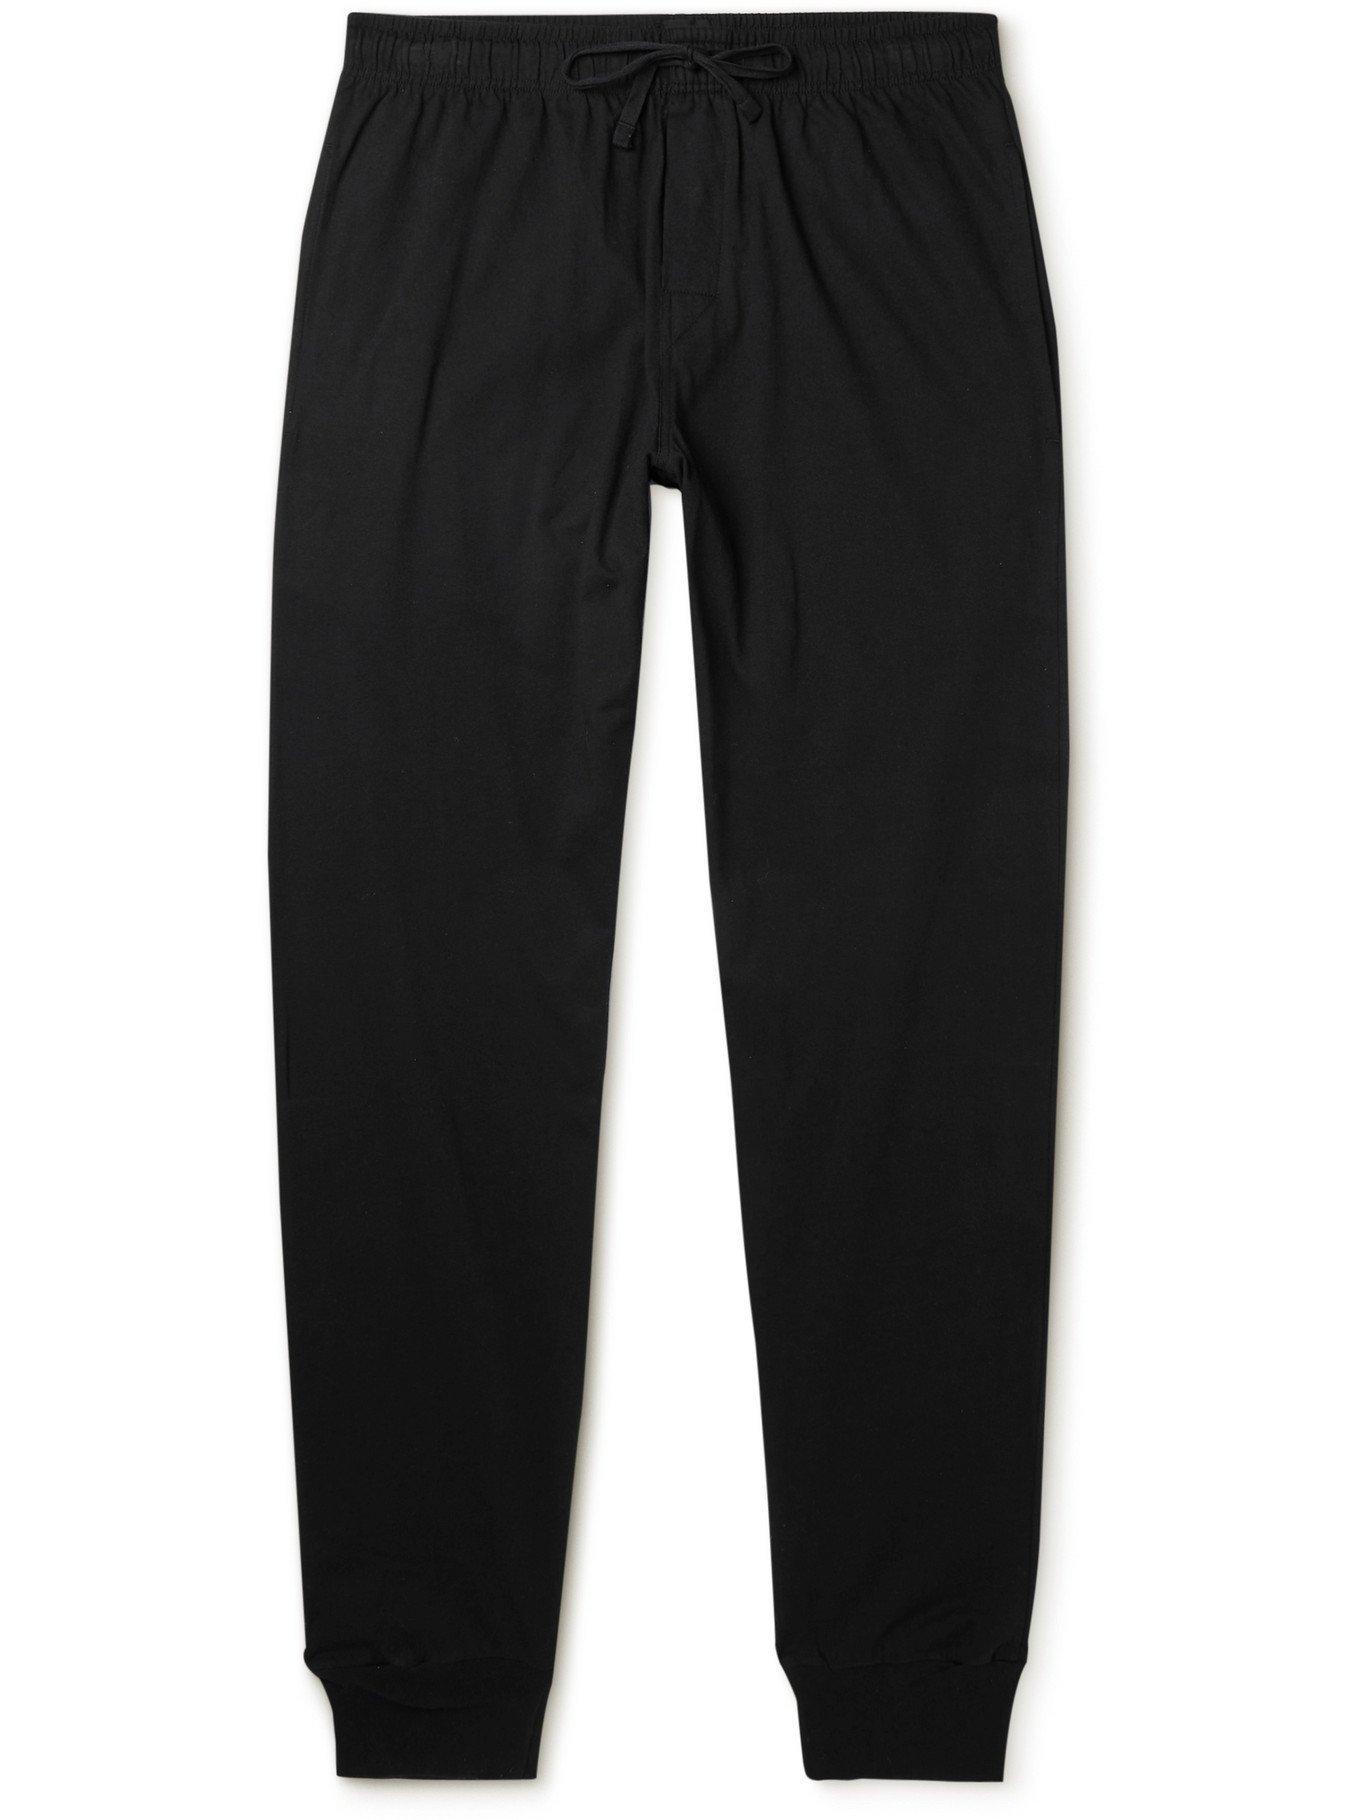 SCHIESSER - Cotton-Jersey Pyjama Trousers - Black - L